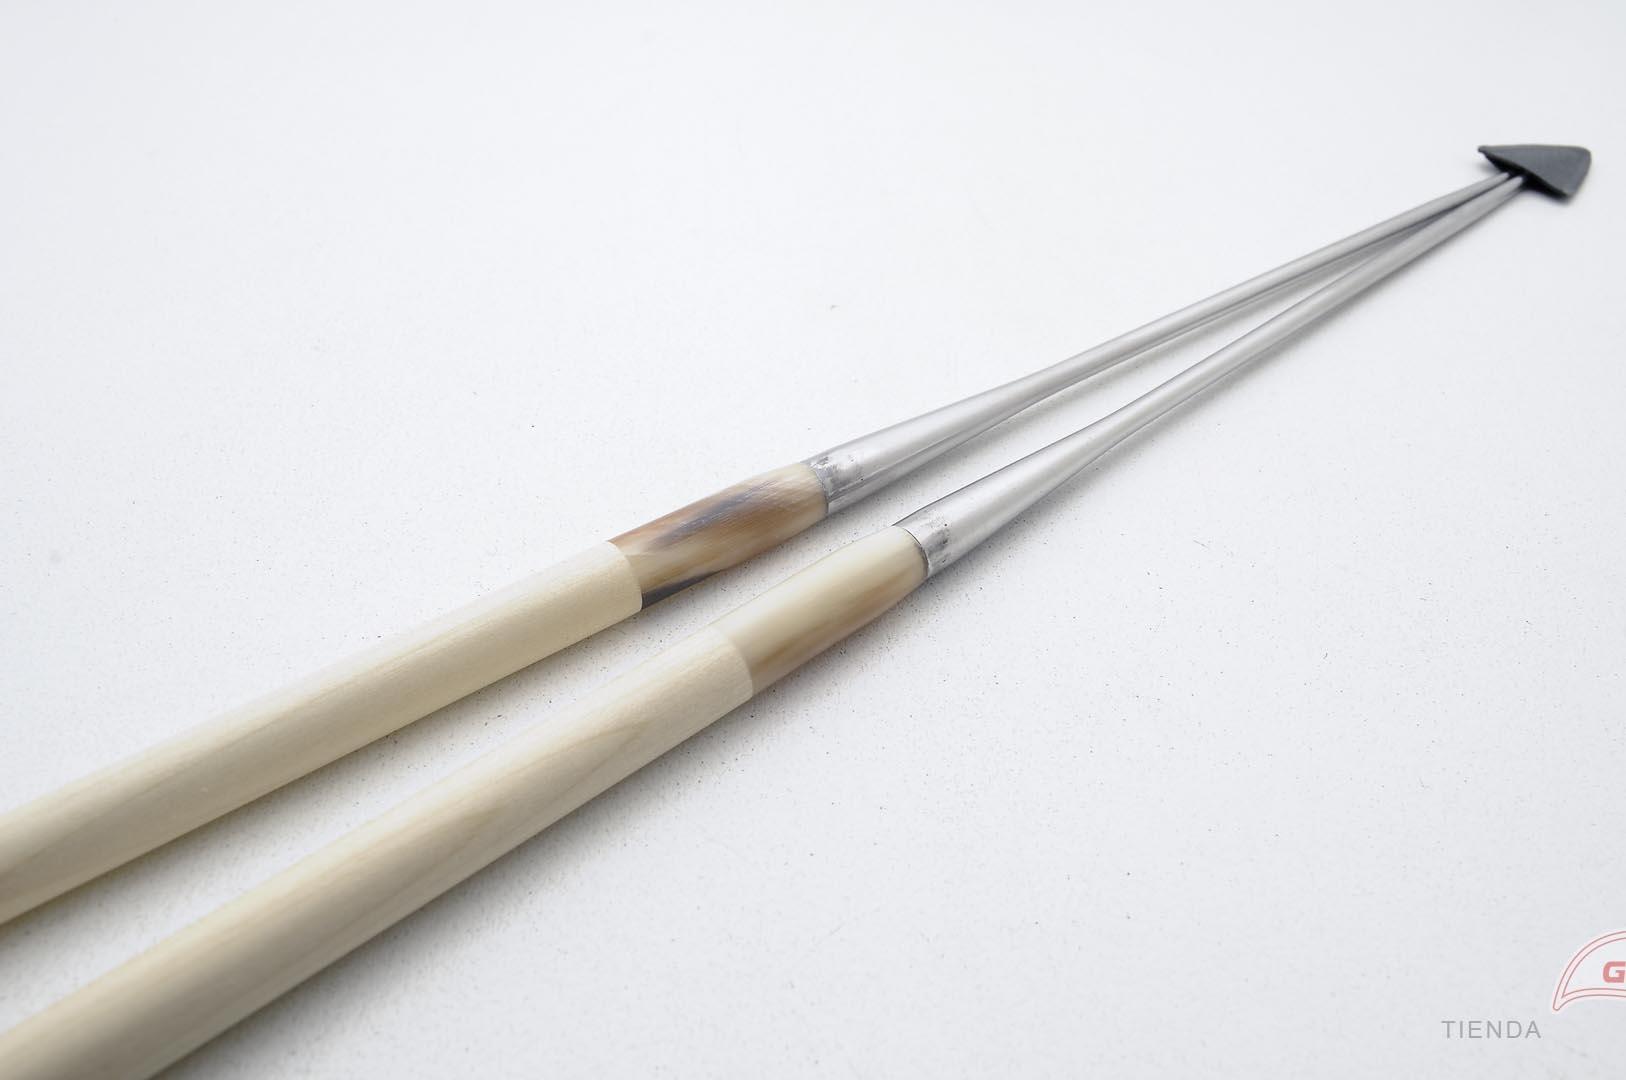 GUB0037-Palitos servir sushi Moribashi Chopsticks metal 21cm GUB0037-max-6.